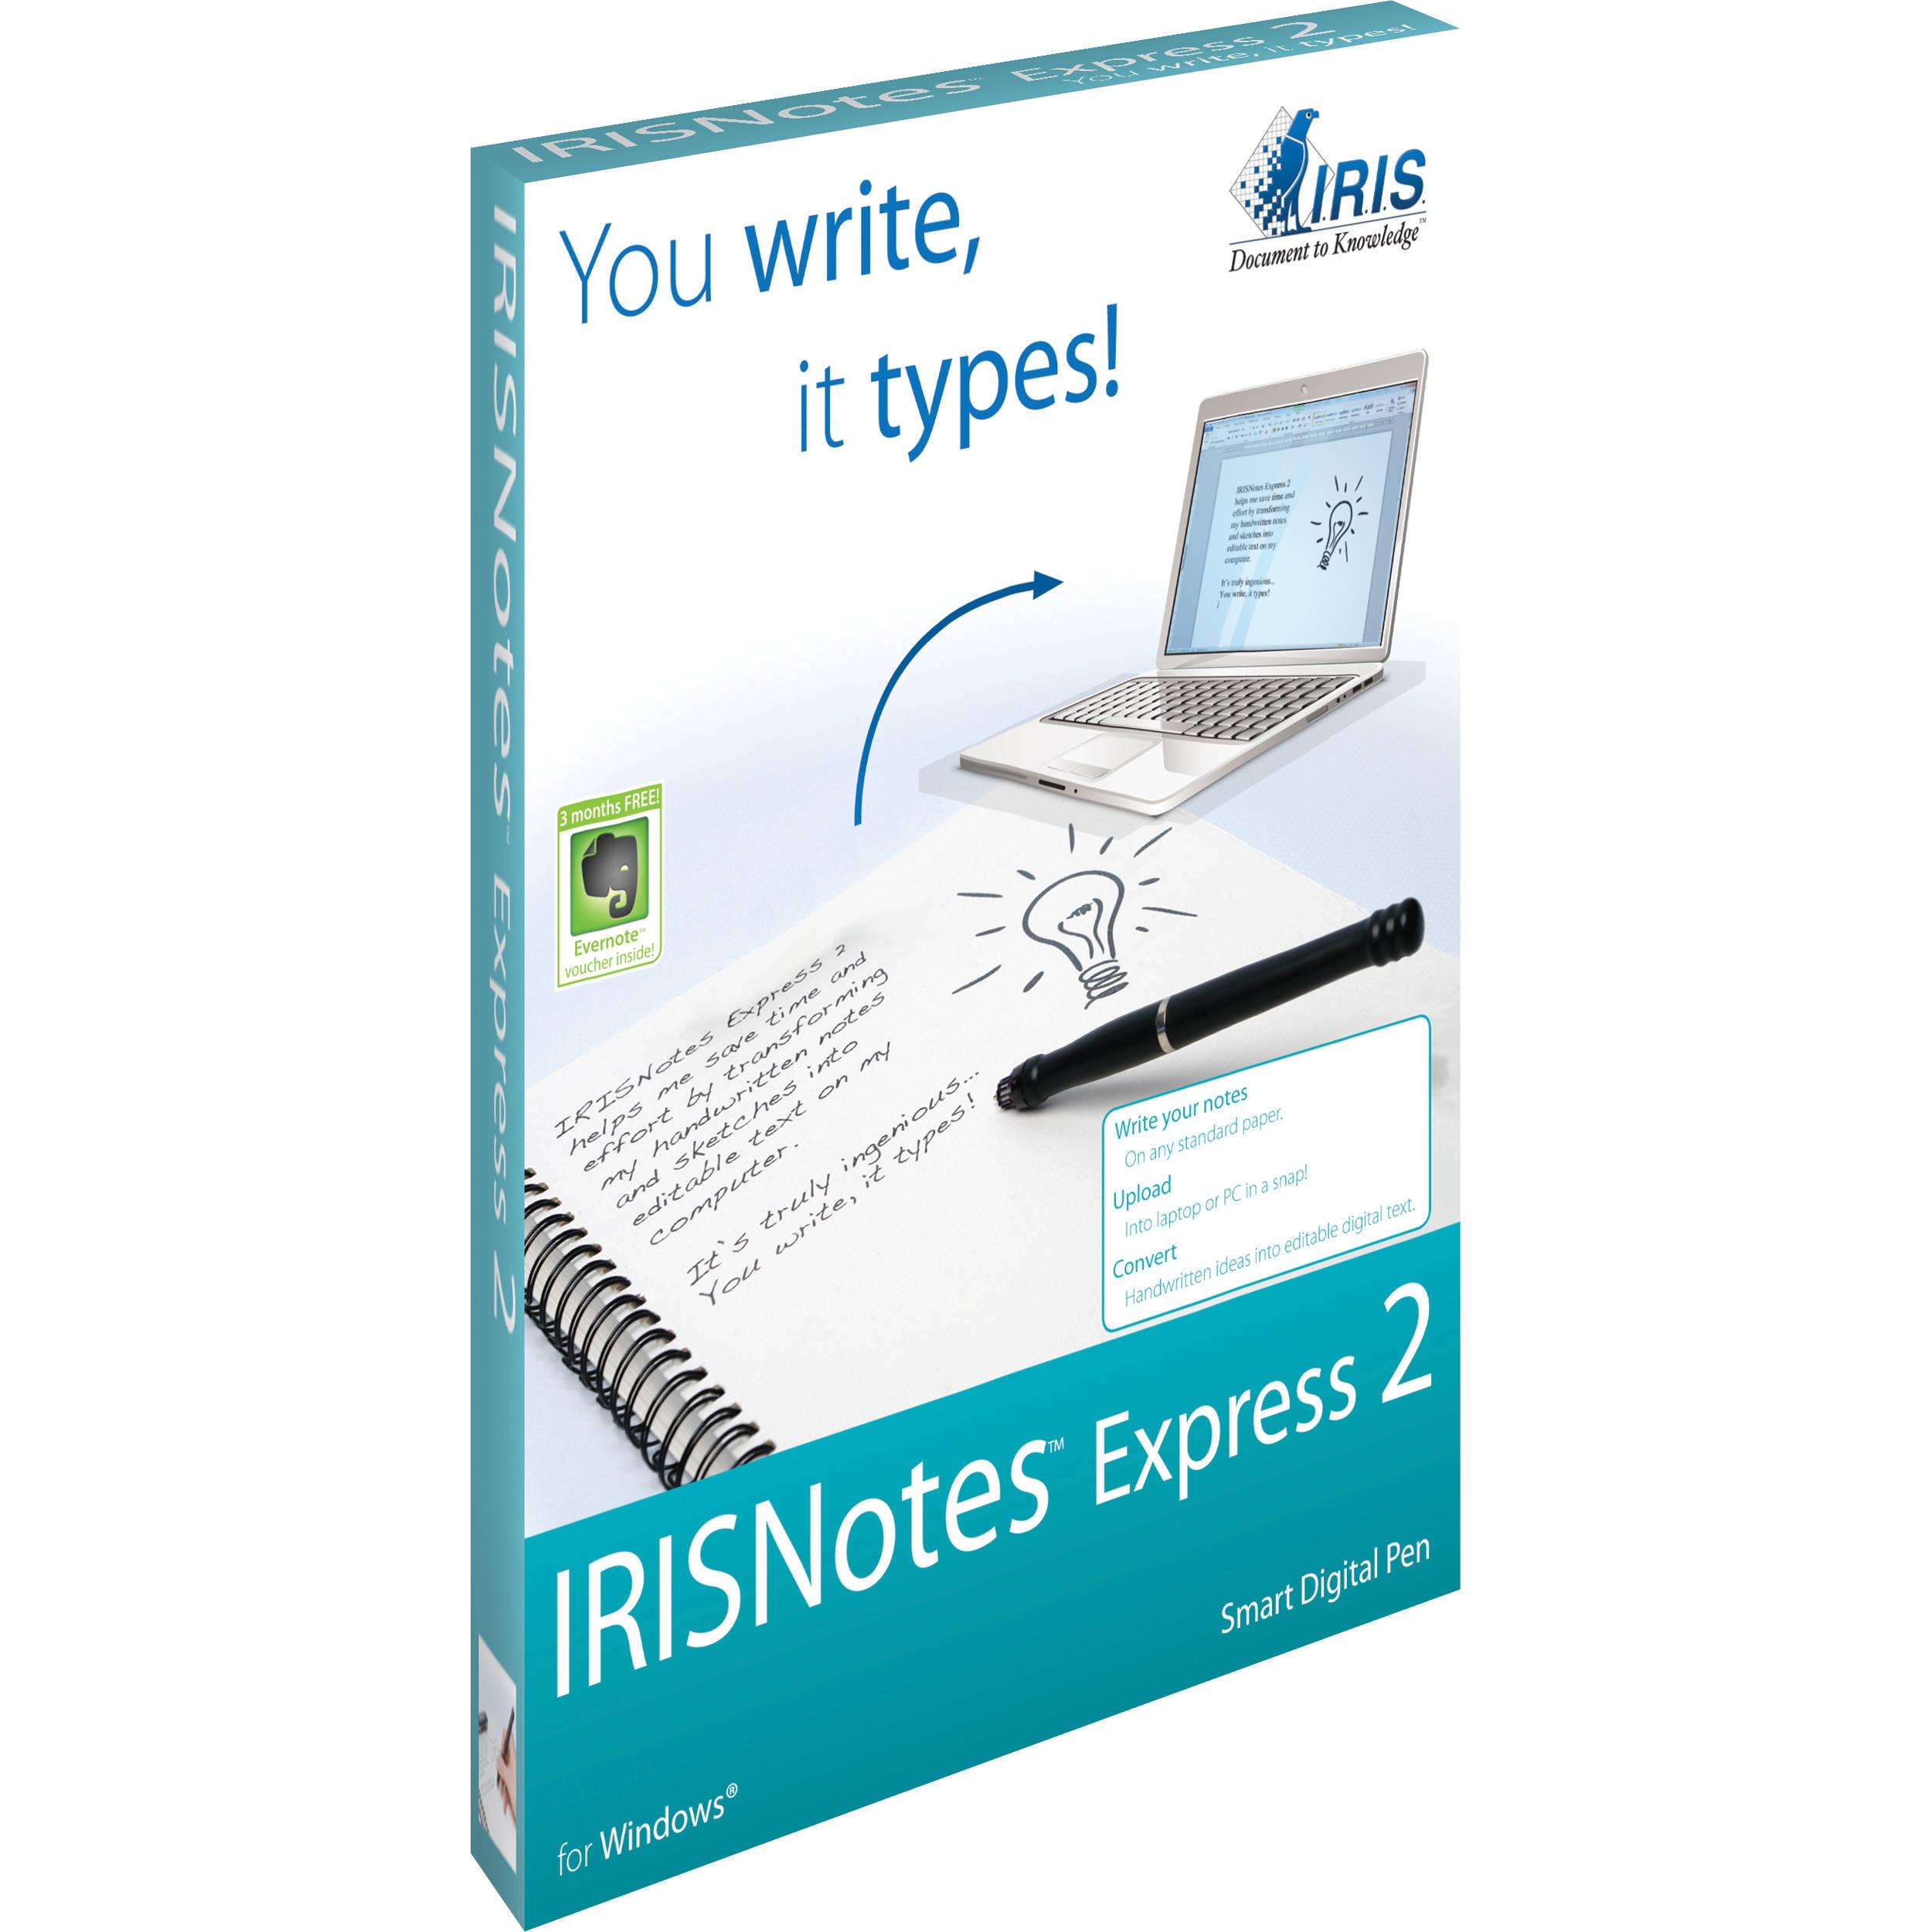 IRISNotes Express 2 Digital Pen for Windows